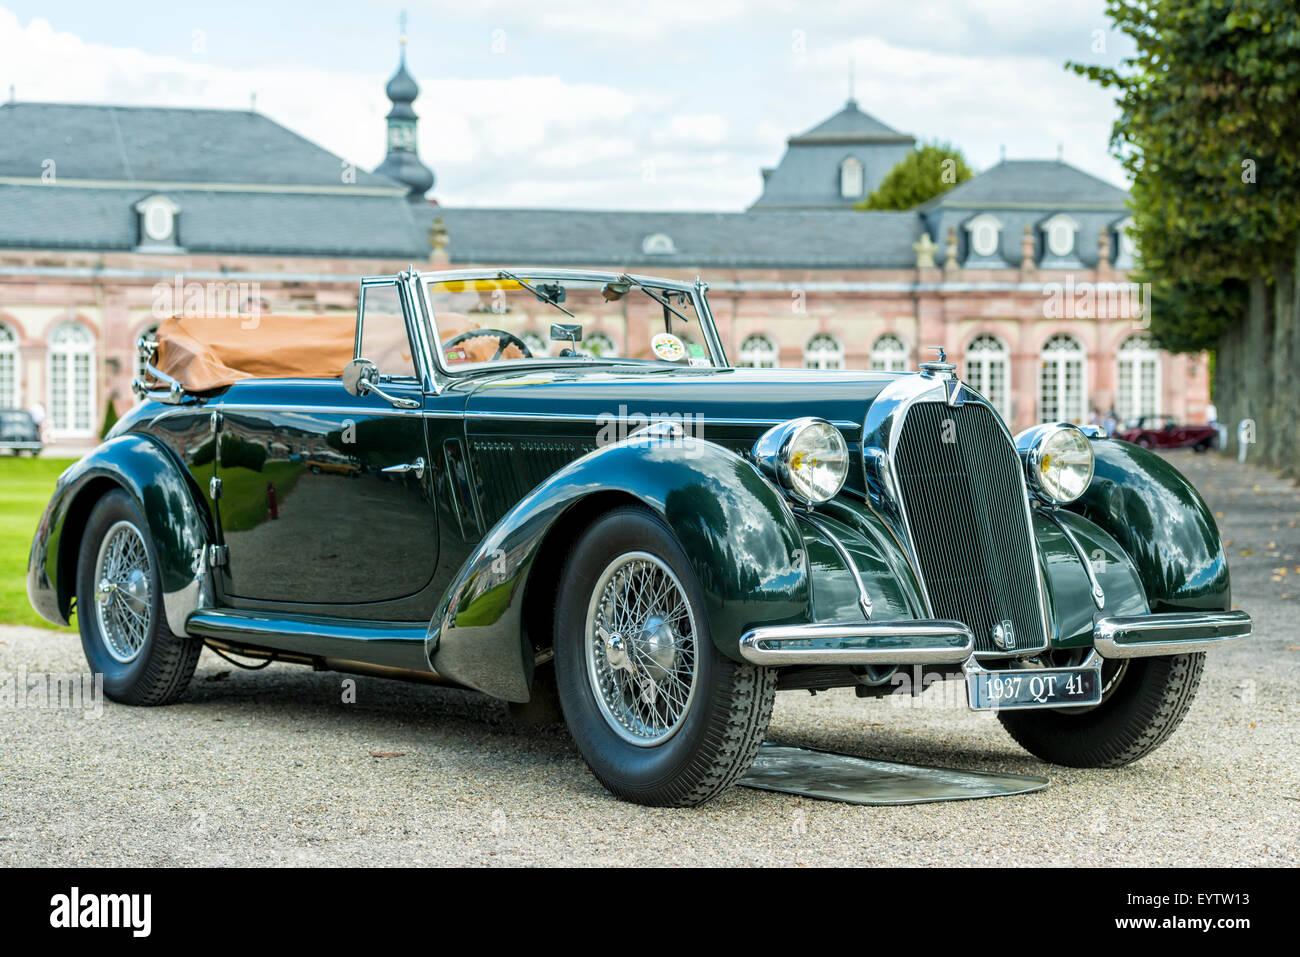 Schwetzingen, Baden-Wurttemberg, Germany, Talbot QT 41, 1937 model, Classic-Gala, Concours d'Elégance in - Stock Image